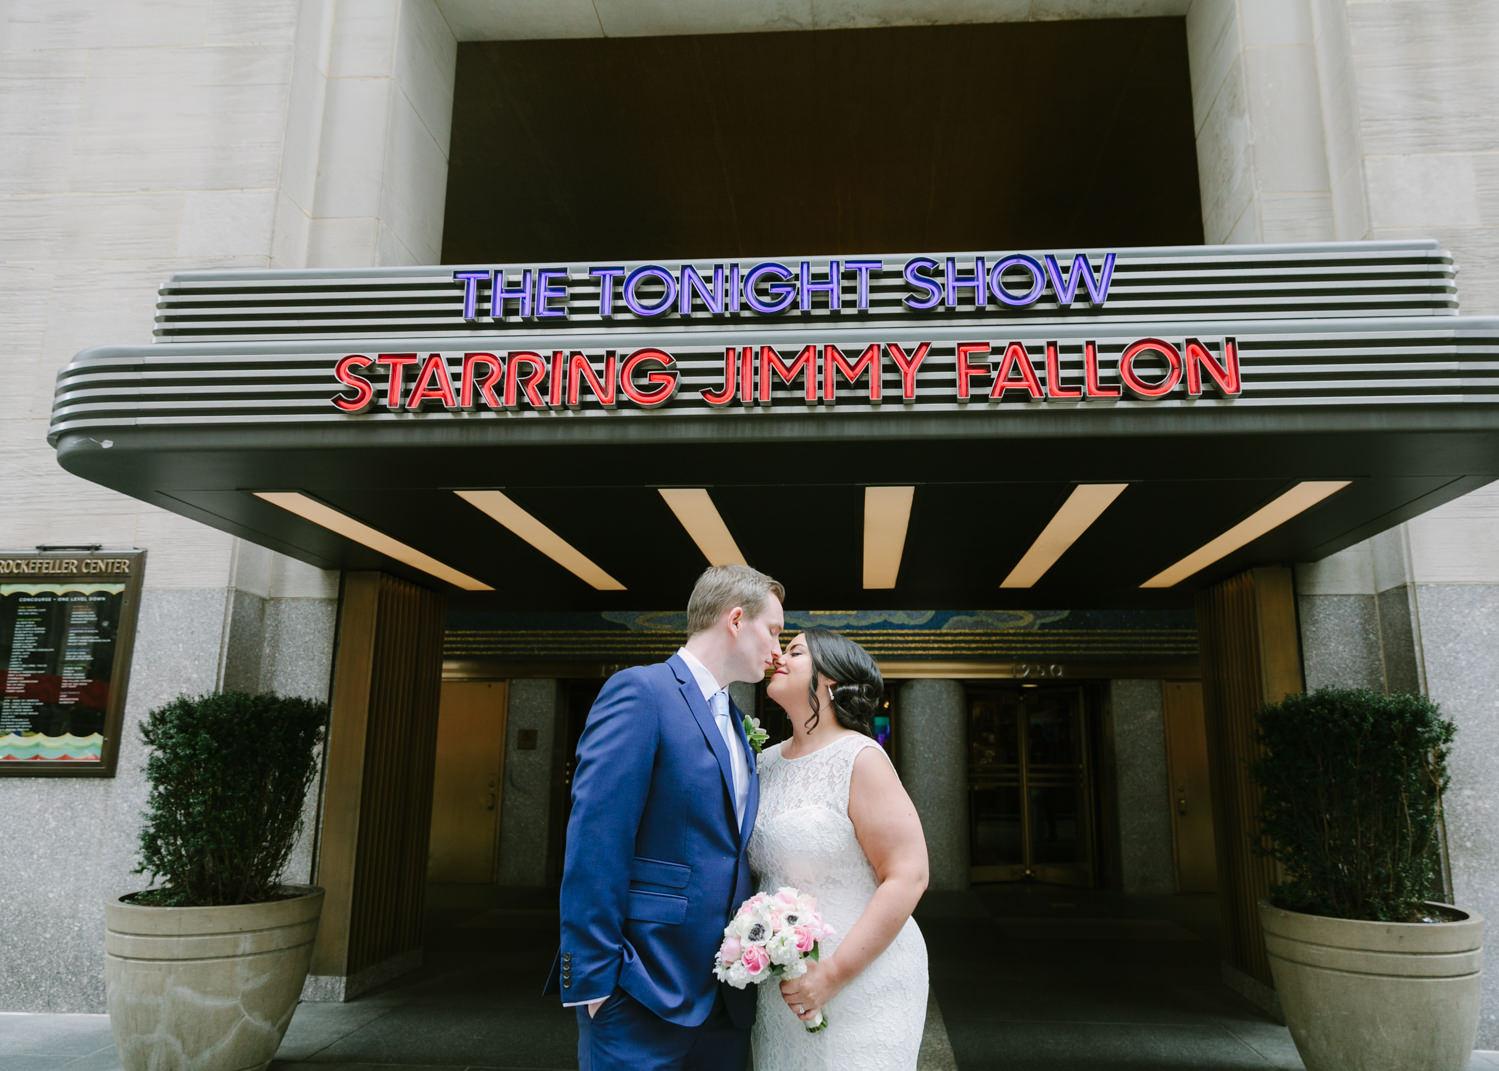 620-loft&garden-intimate-wedding-J&A-144.jpg